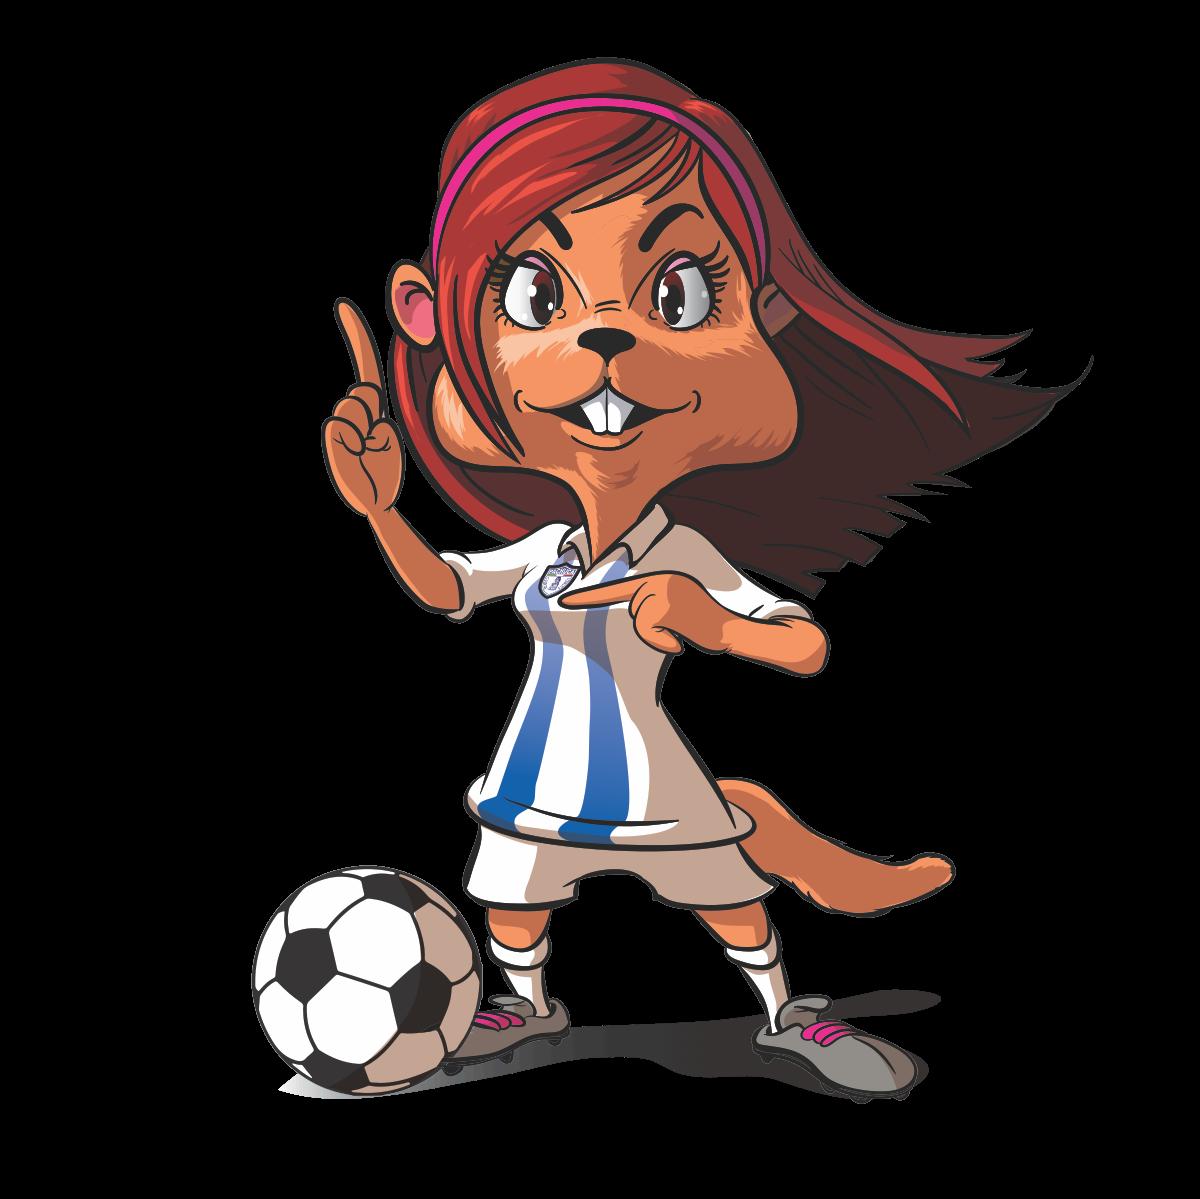 FEMALE MASCOT DESIGN FOR PROFESSIONAL FEMALE FOOTBALL TEAM